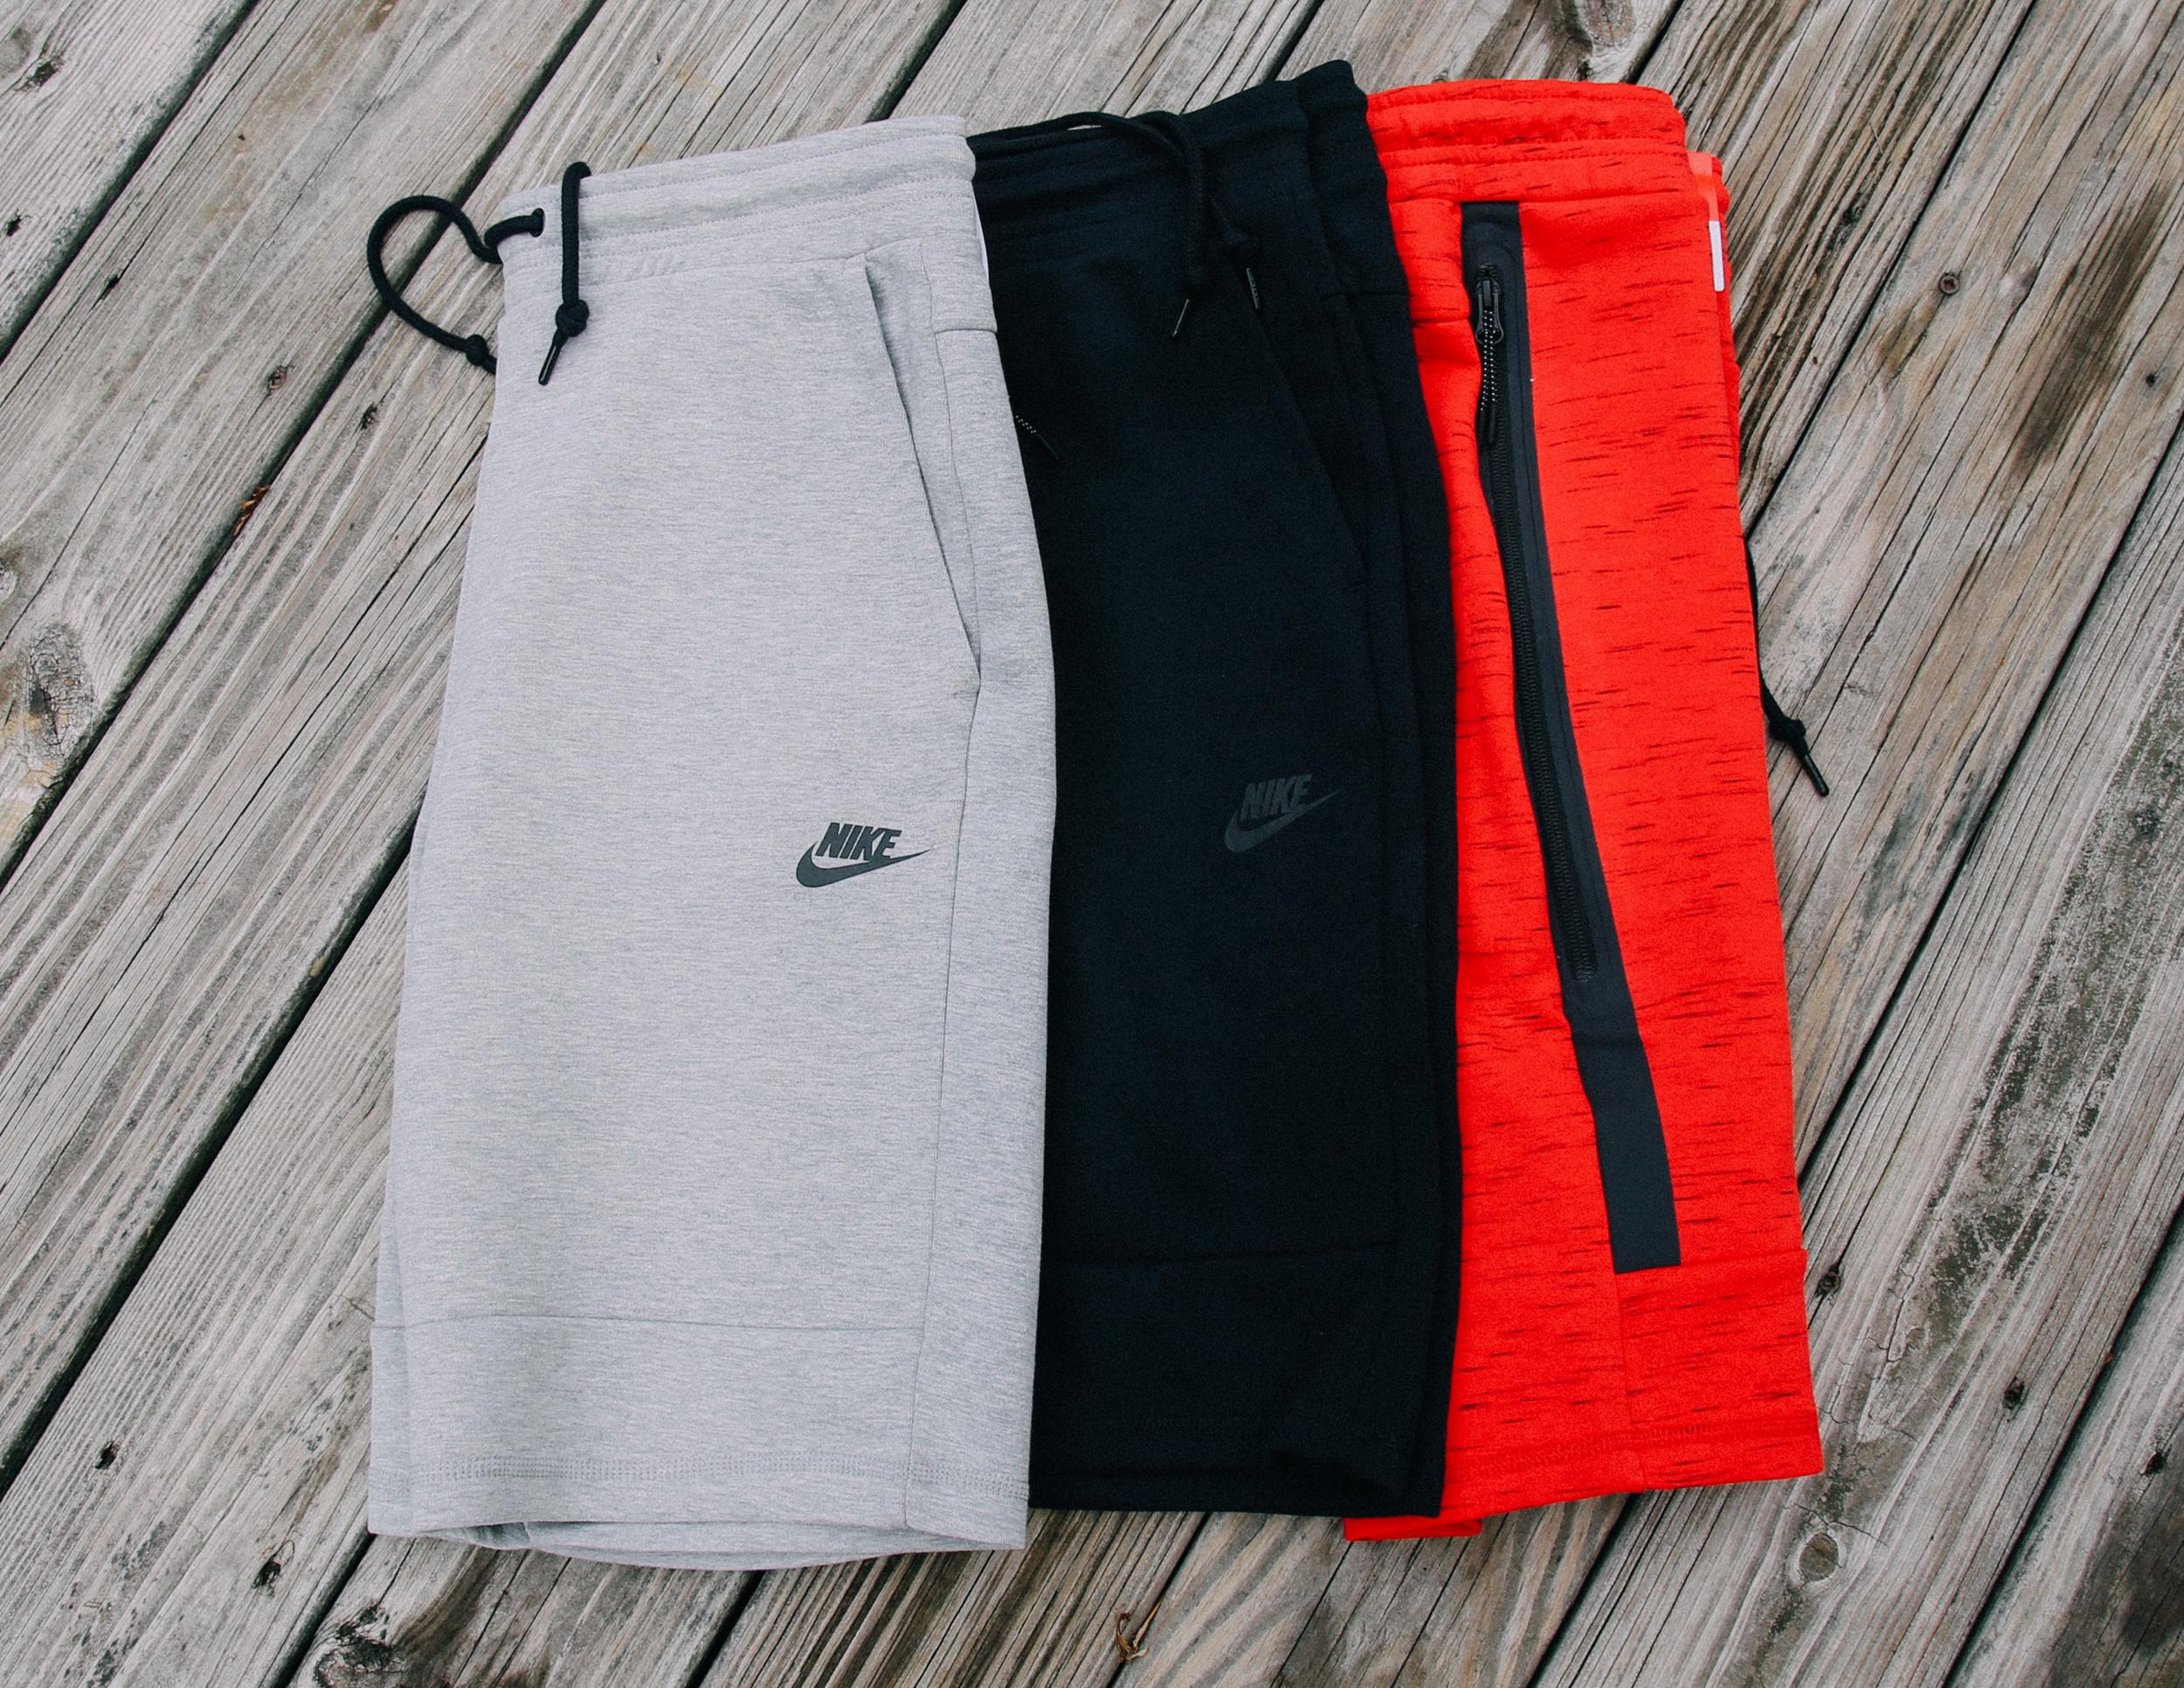 Nike-Tech-Fleece-Shorts-Tapered_4282.jpg